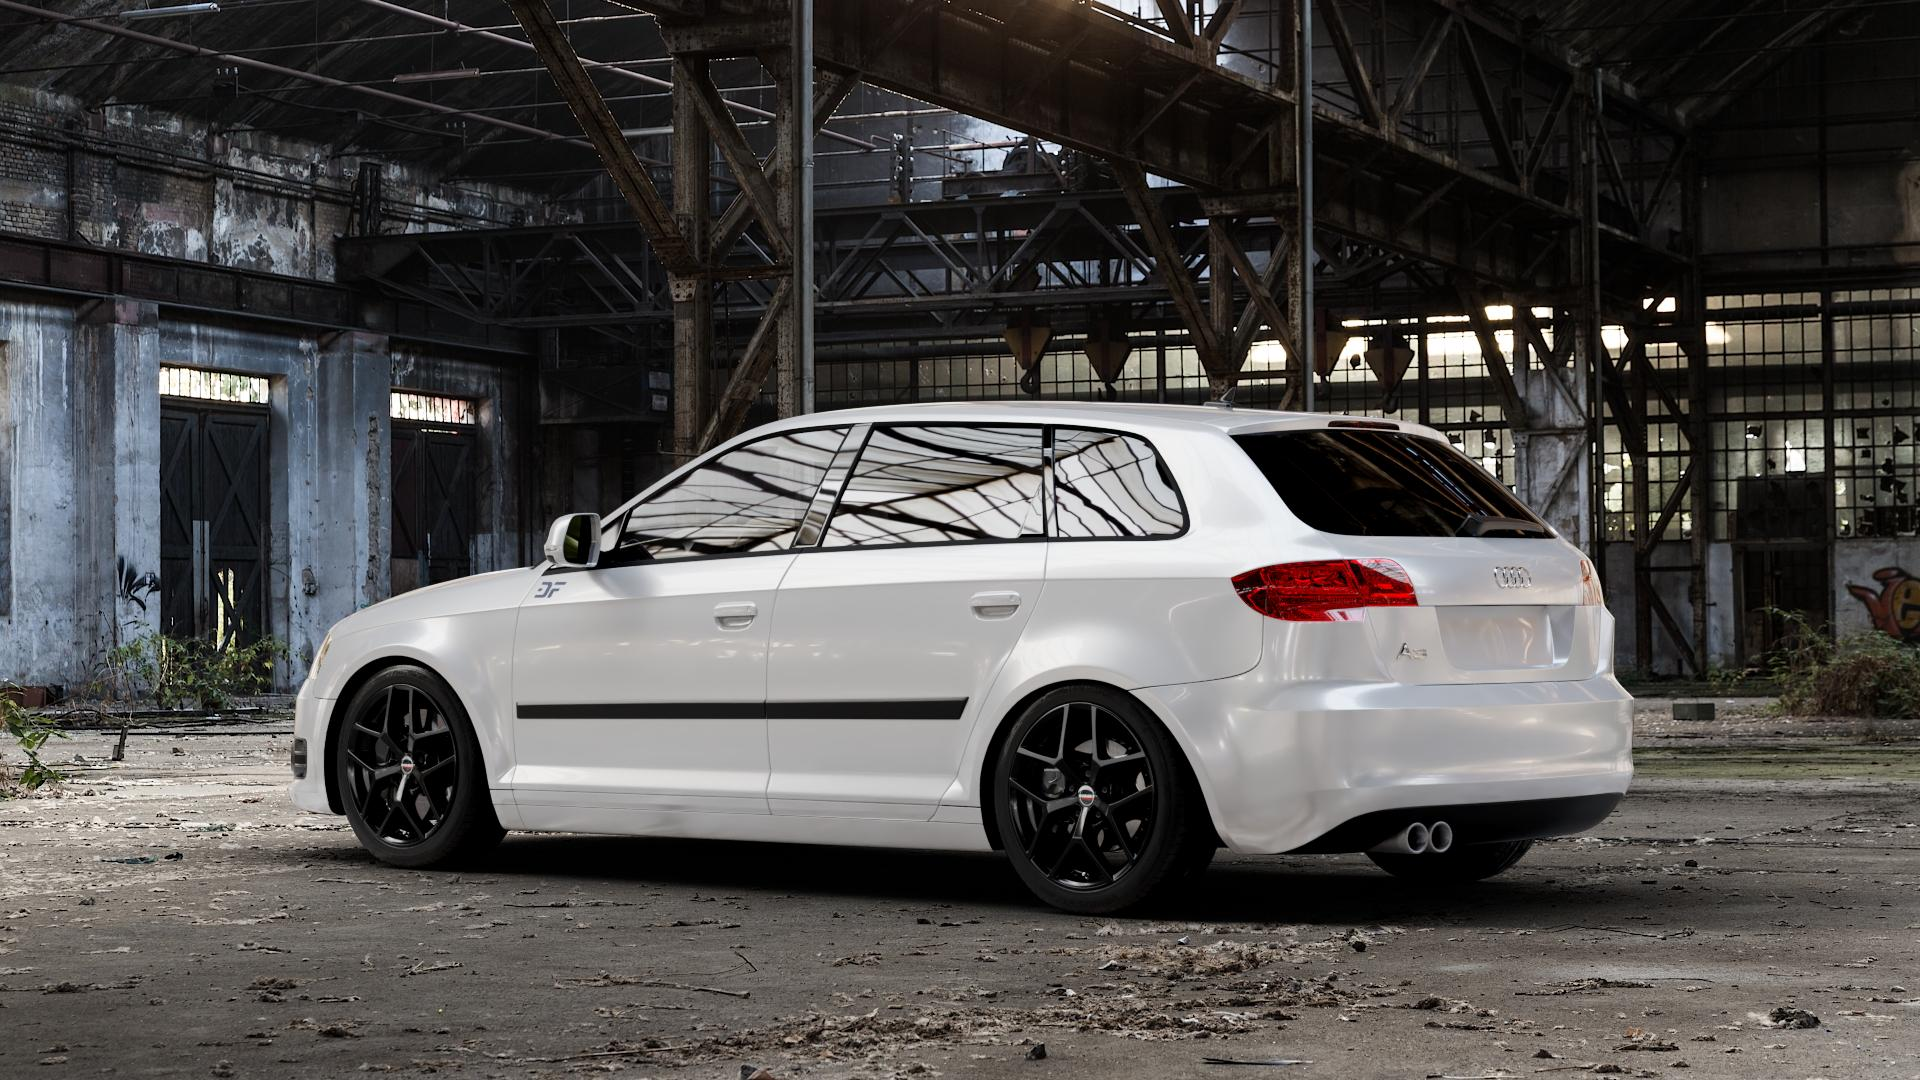 Borbet Y black glossy Felge mit Reifen schwarz in 17Zoll Winterfelge Alufelge auf weissem Audi A3 Typ 8P (Sportback) 1,6l 75kW (102 PS) 2,0l FSI 110kW (150 1,9l TDI 77kW (105 103kW (140 TFSI 147kW (200 85kW (116 100kW (136 1,8l 118kW (160 125kW (170 1,4l 92kW (125 120kW (163 quattro 3,2l V6 184kW (250 S3 195kW (265 1,2l 66kW (90 18